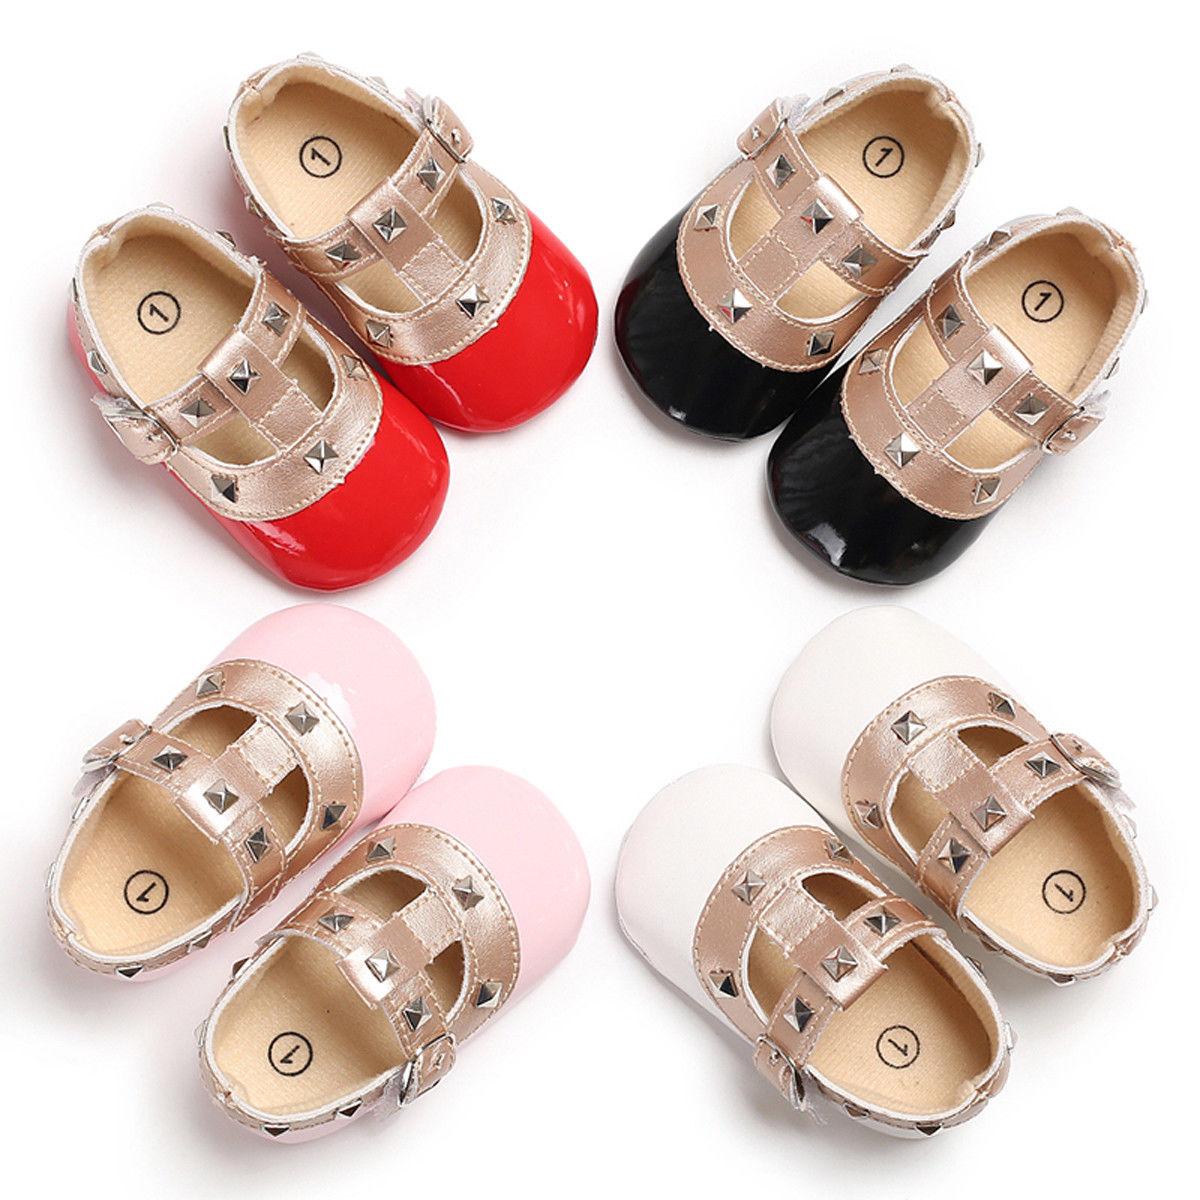 Newborn Baby Girls Bow Princess Shoes Anti-slip Soft Sole Crib Sneaker Prewalker PU First Walkers For 0-18M